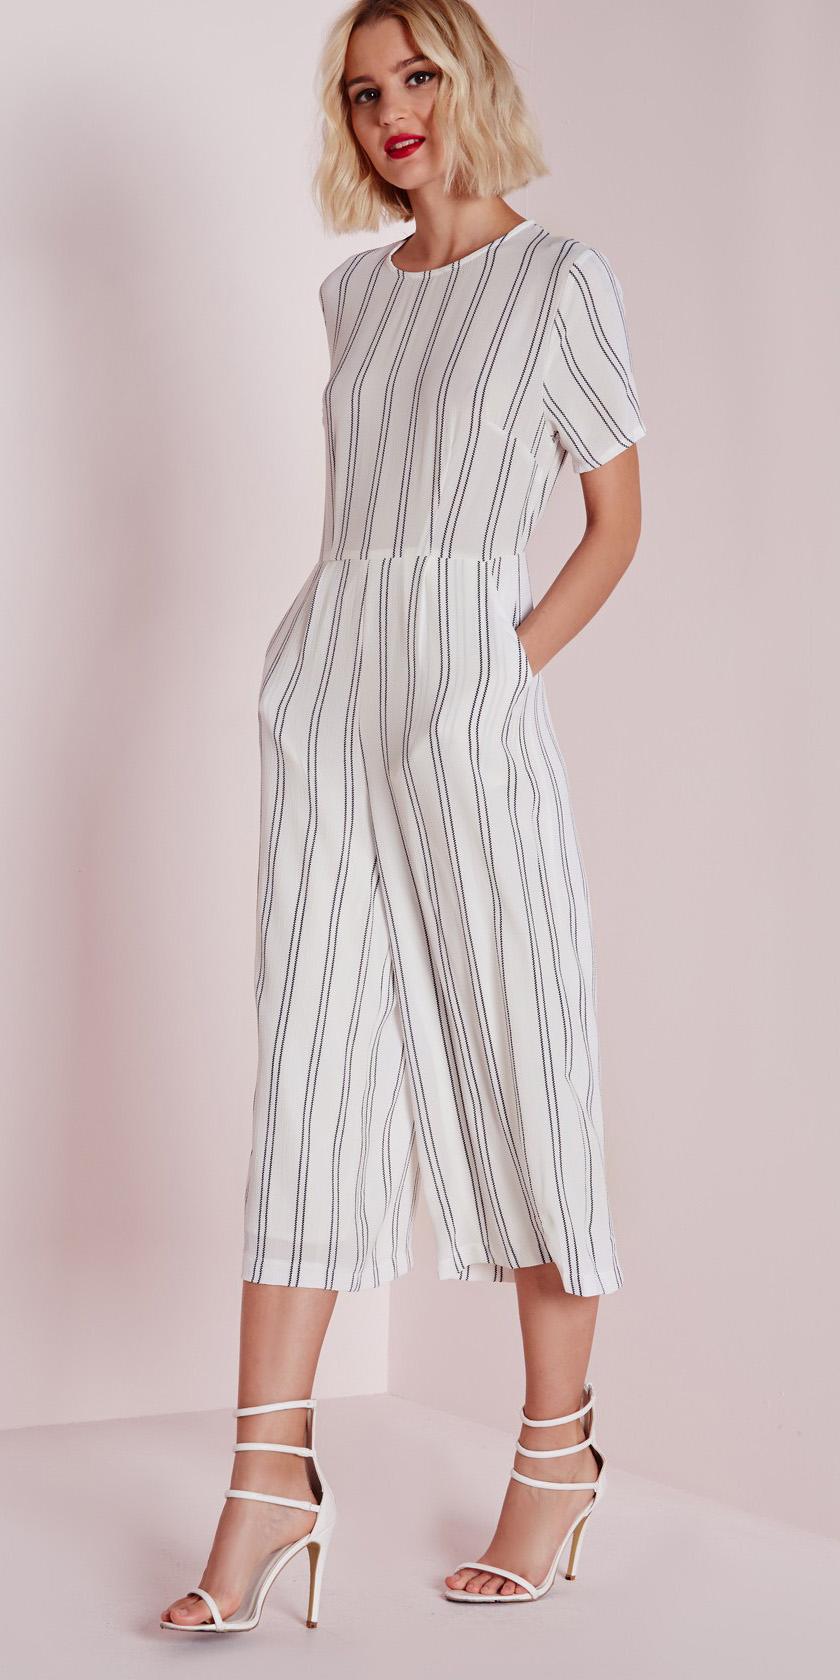 white-jumpsuit-white-shoe-sandalh-pinstripe-vertical-stripe-cropped-spring-summer-blonde-dinner.jpg